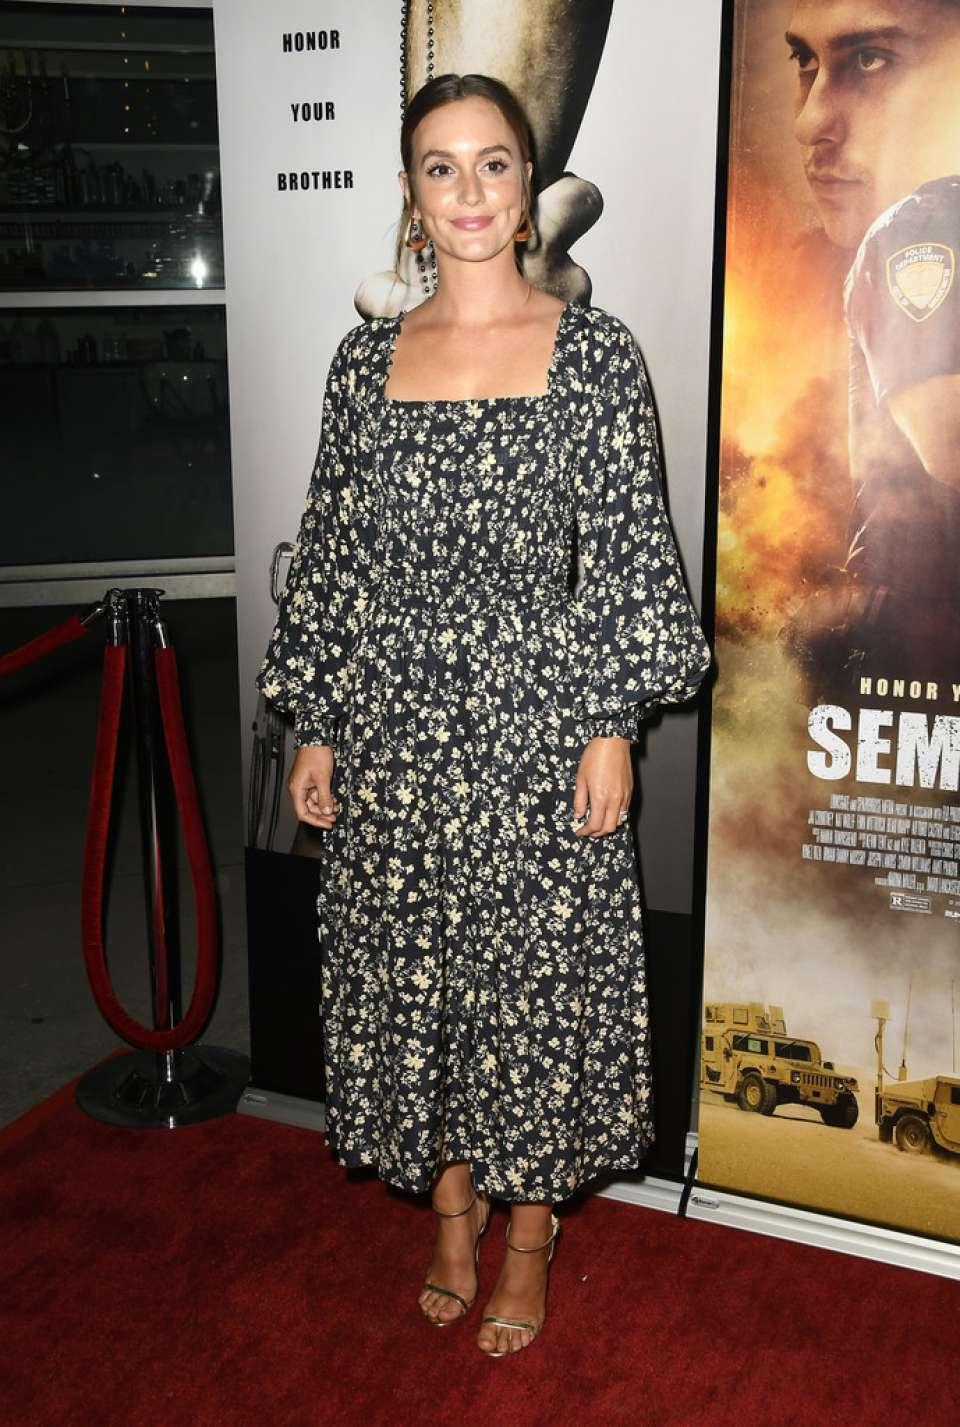 Leighton Meester - 'Semper Fi' Screening in Hollywood